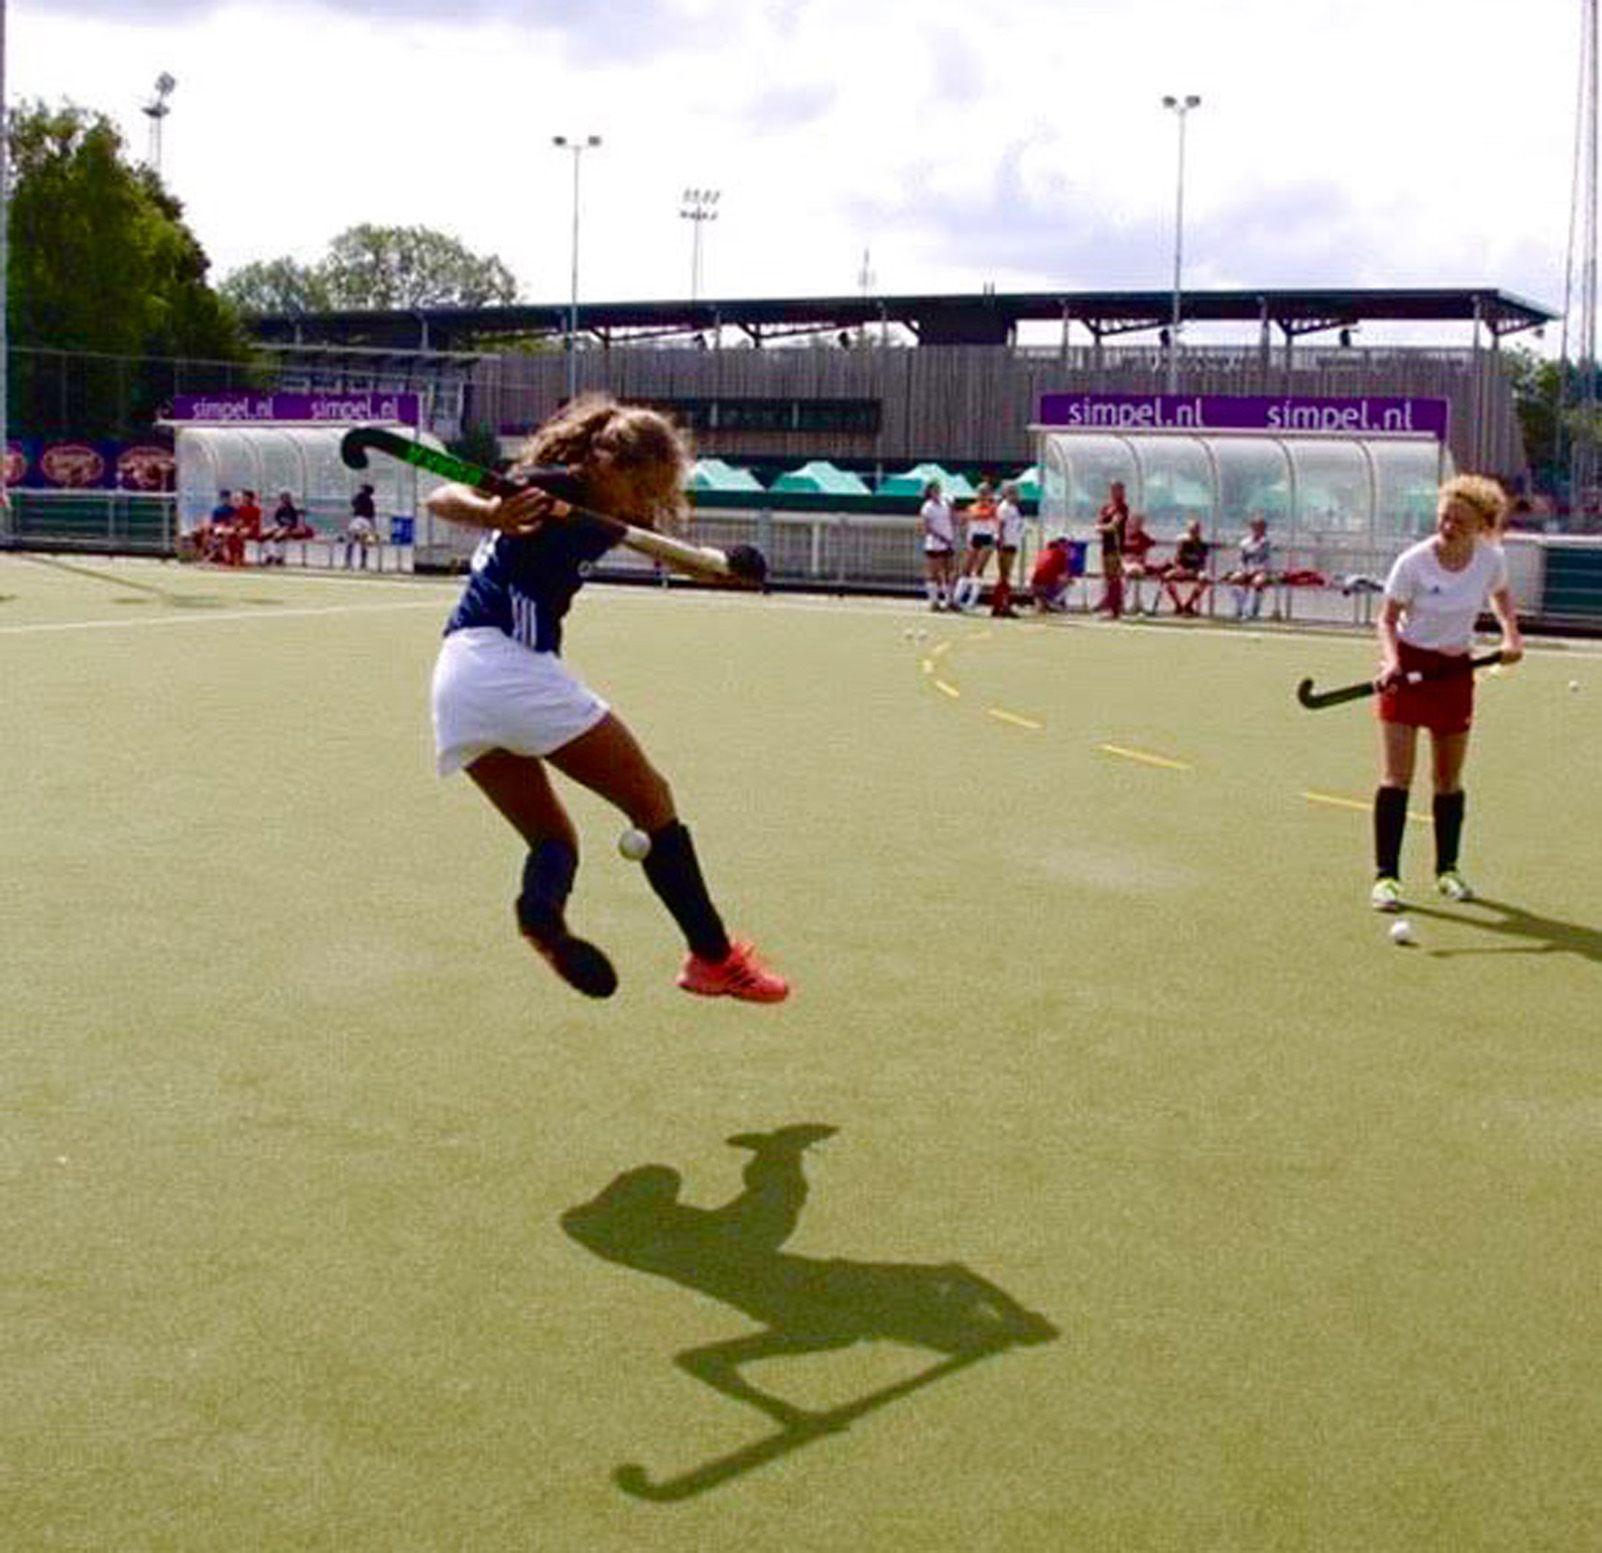 Blanca Tapiz   Agilitat, estil i una mica de postureig   Amsterdam  Field Hockey Campus